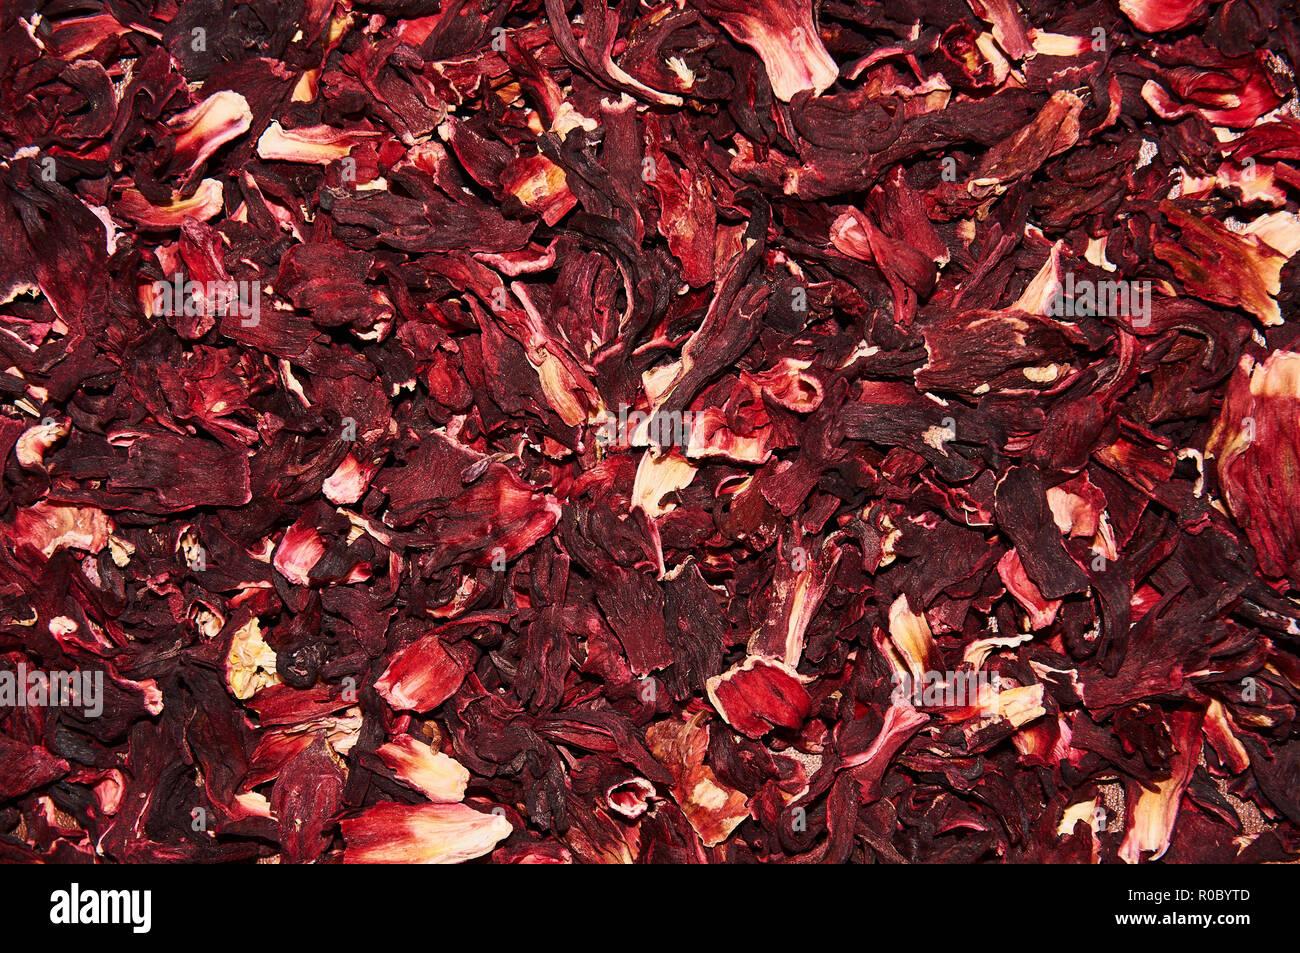 Hibiscus tea on a white background. - Stock Image